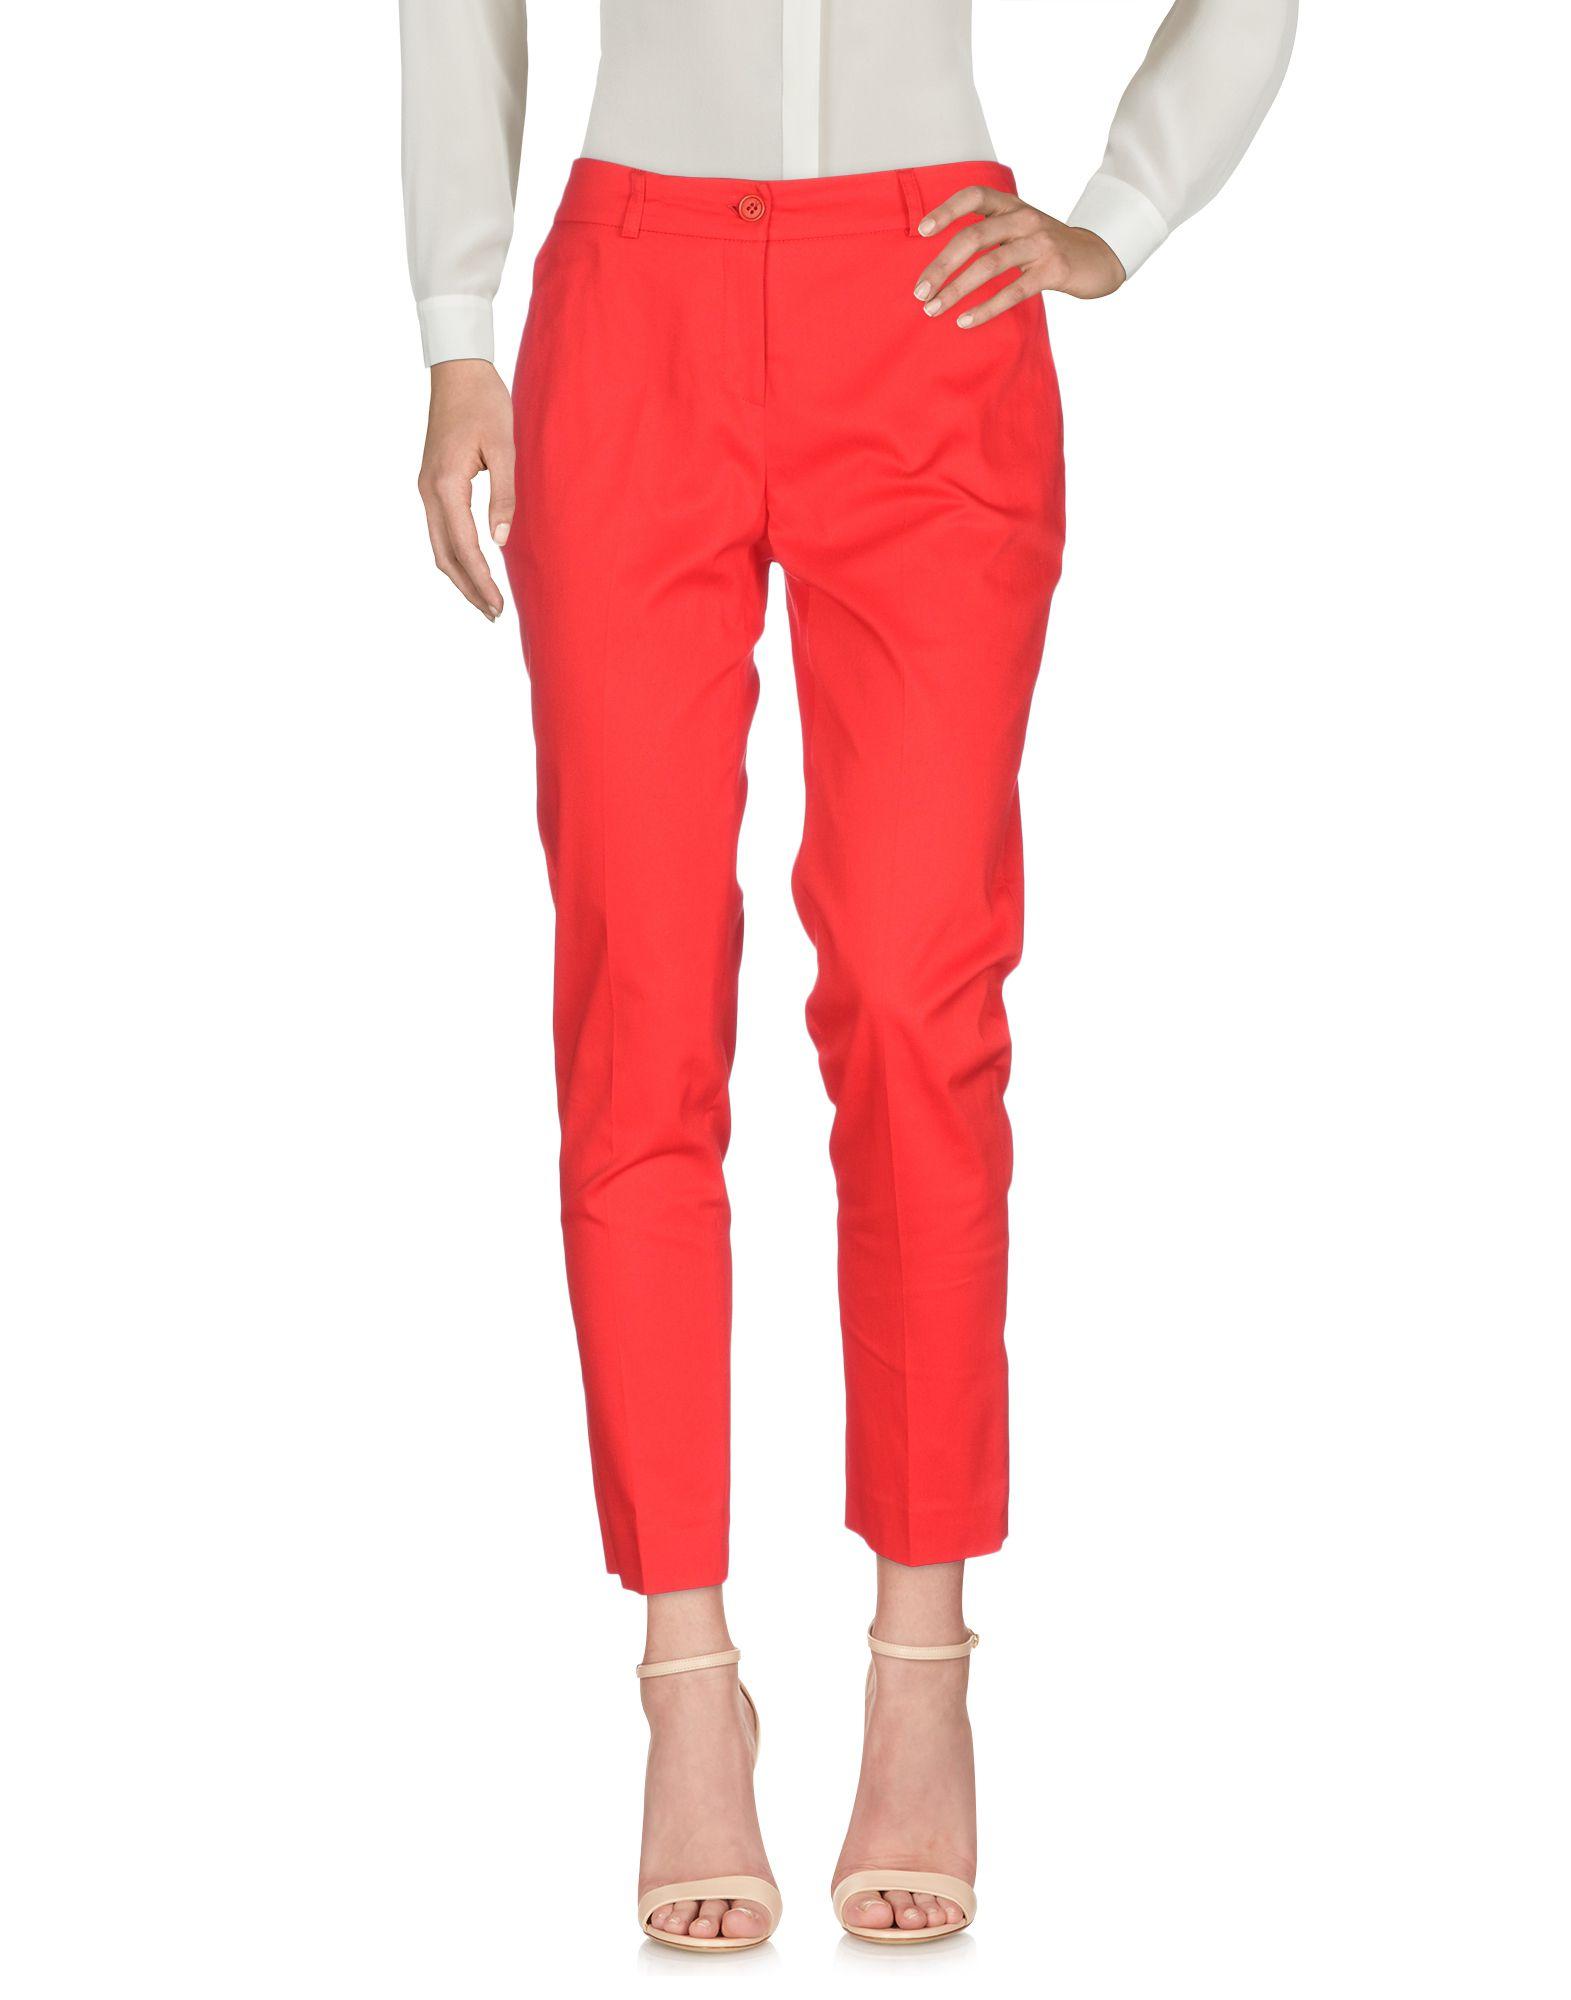 Pantalone Pantalone Hope Collection donna - 13153534IC  Förderungen